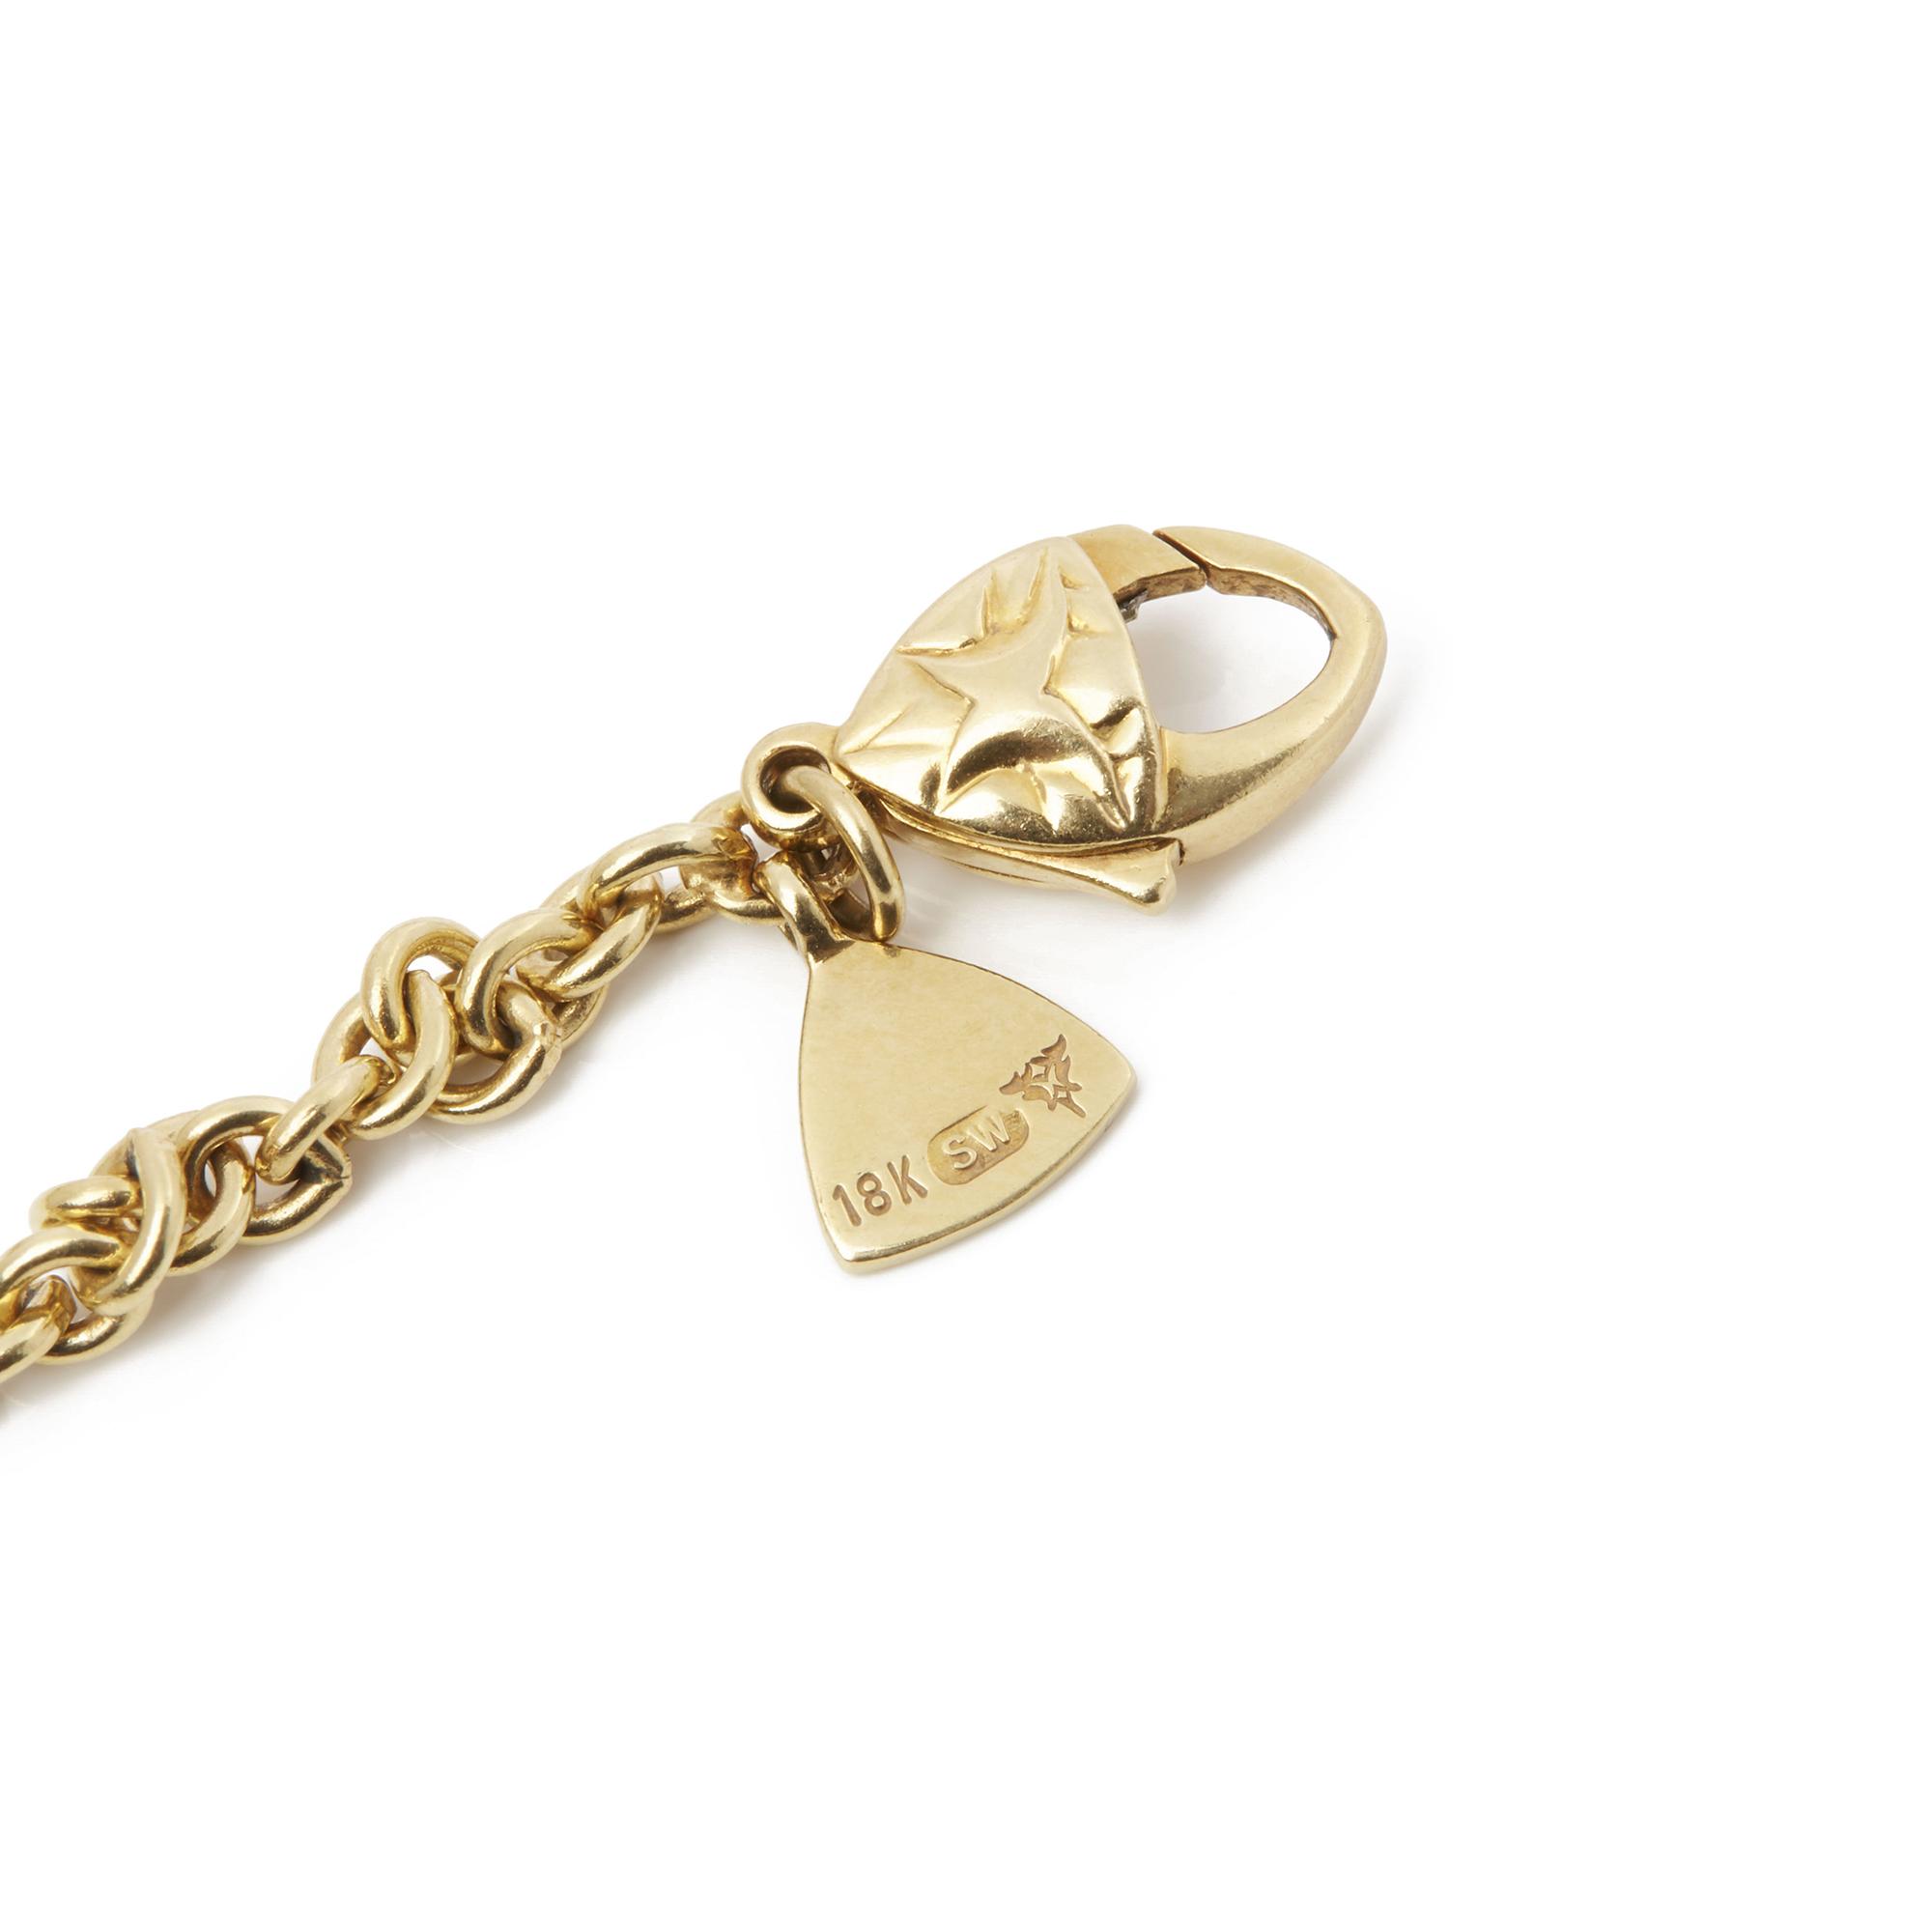 Stephen Webster 18k Yellow Gold Citrine & Diamond Crystal Haze Pendant Necklace - Image 5 of 8